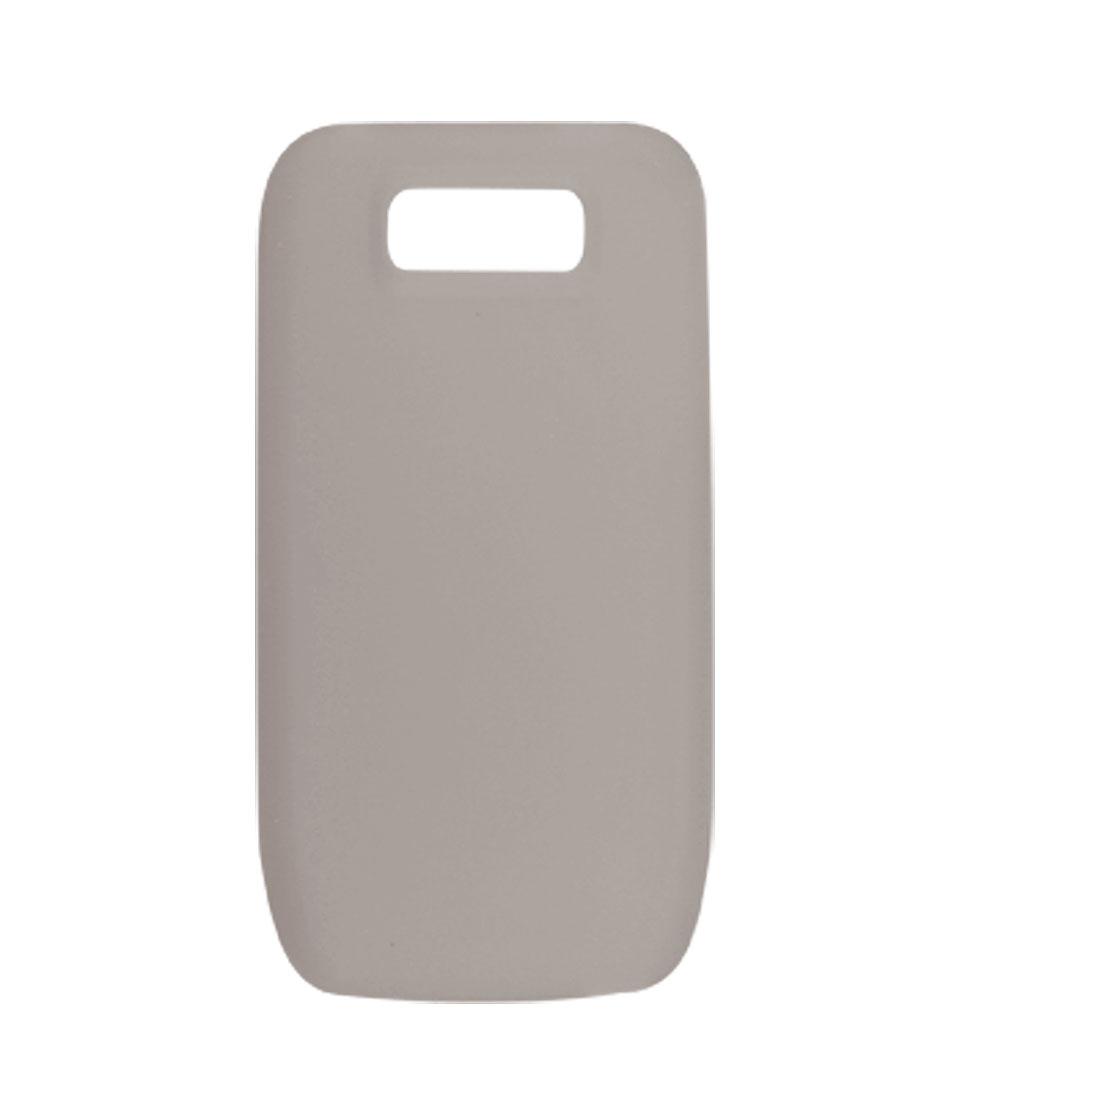 Protective Soft Plastic Skin Cover Gray for Nokia E63